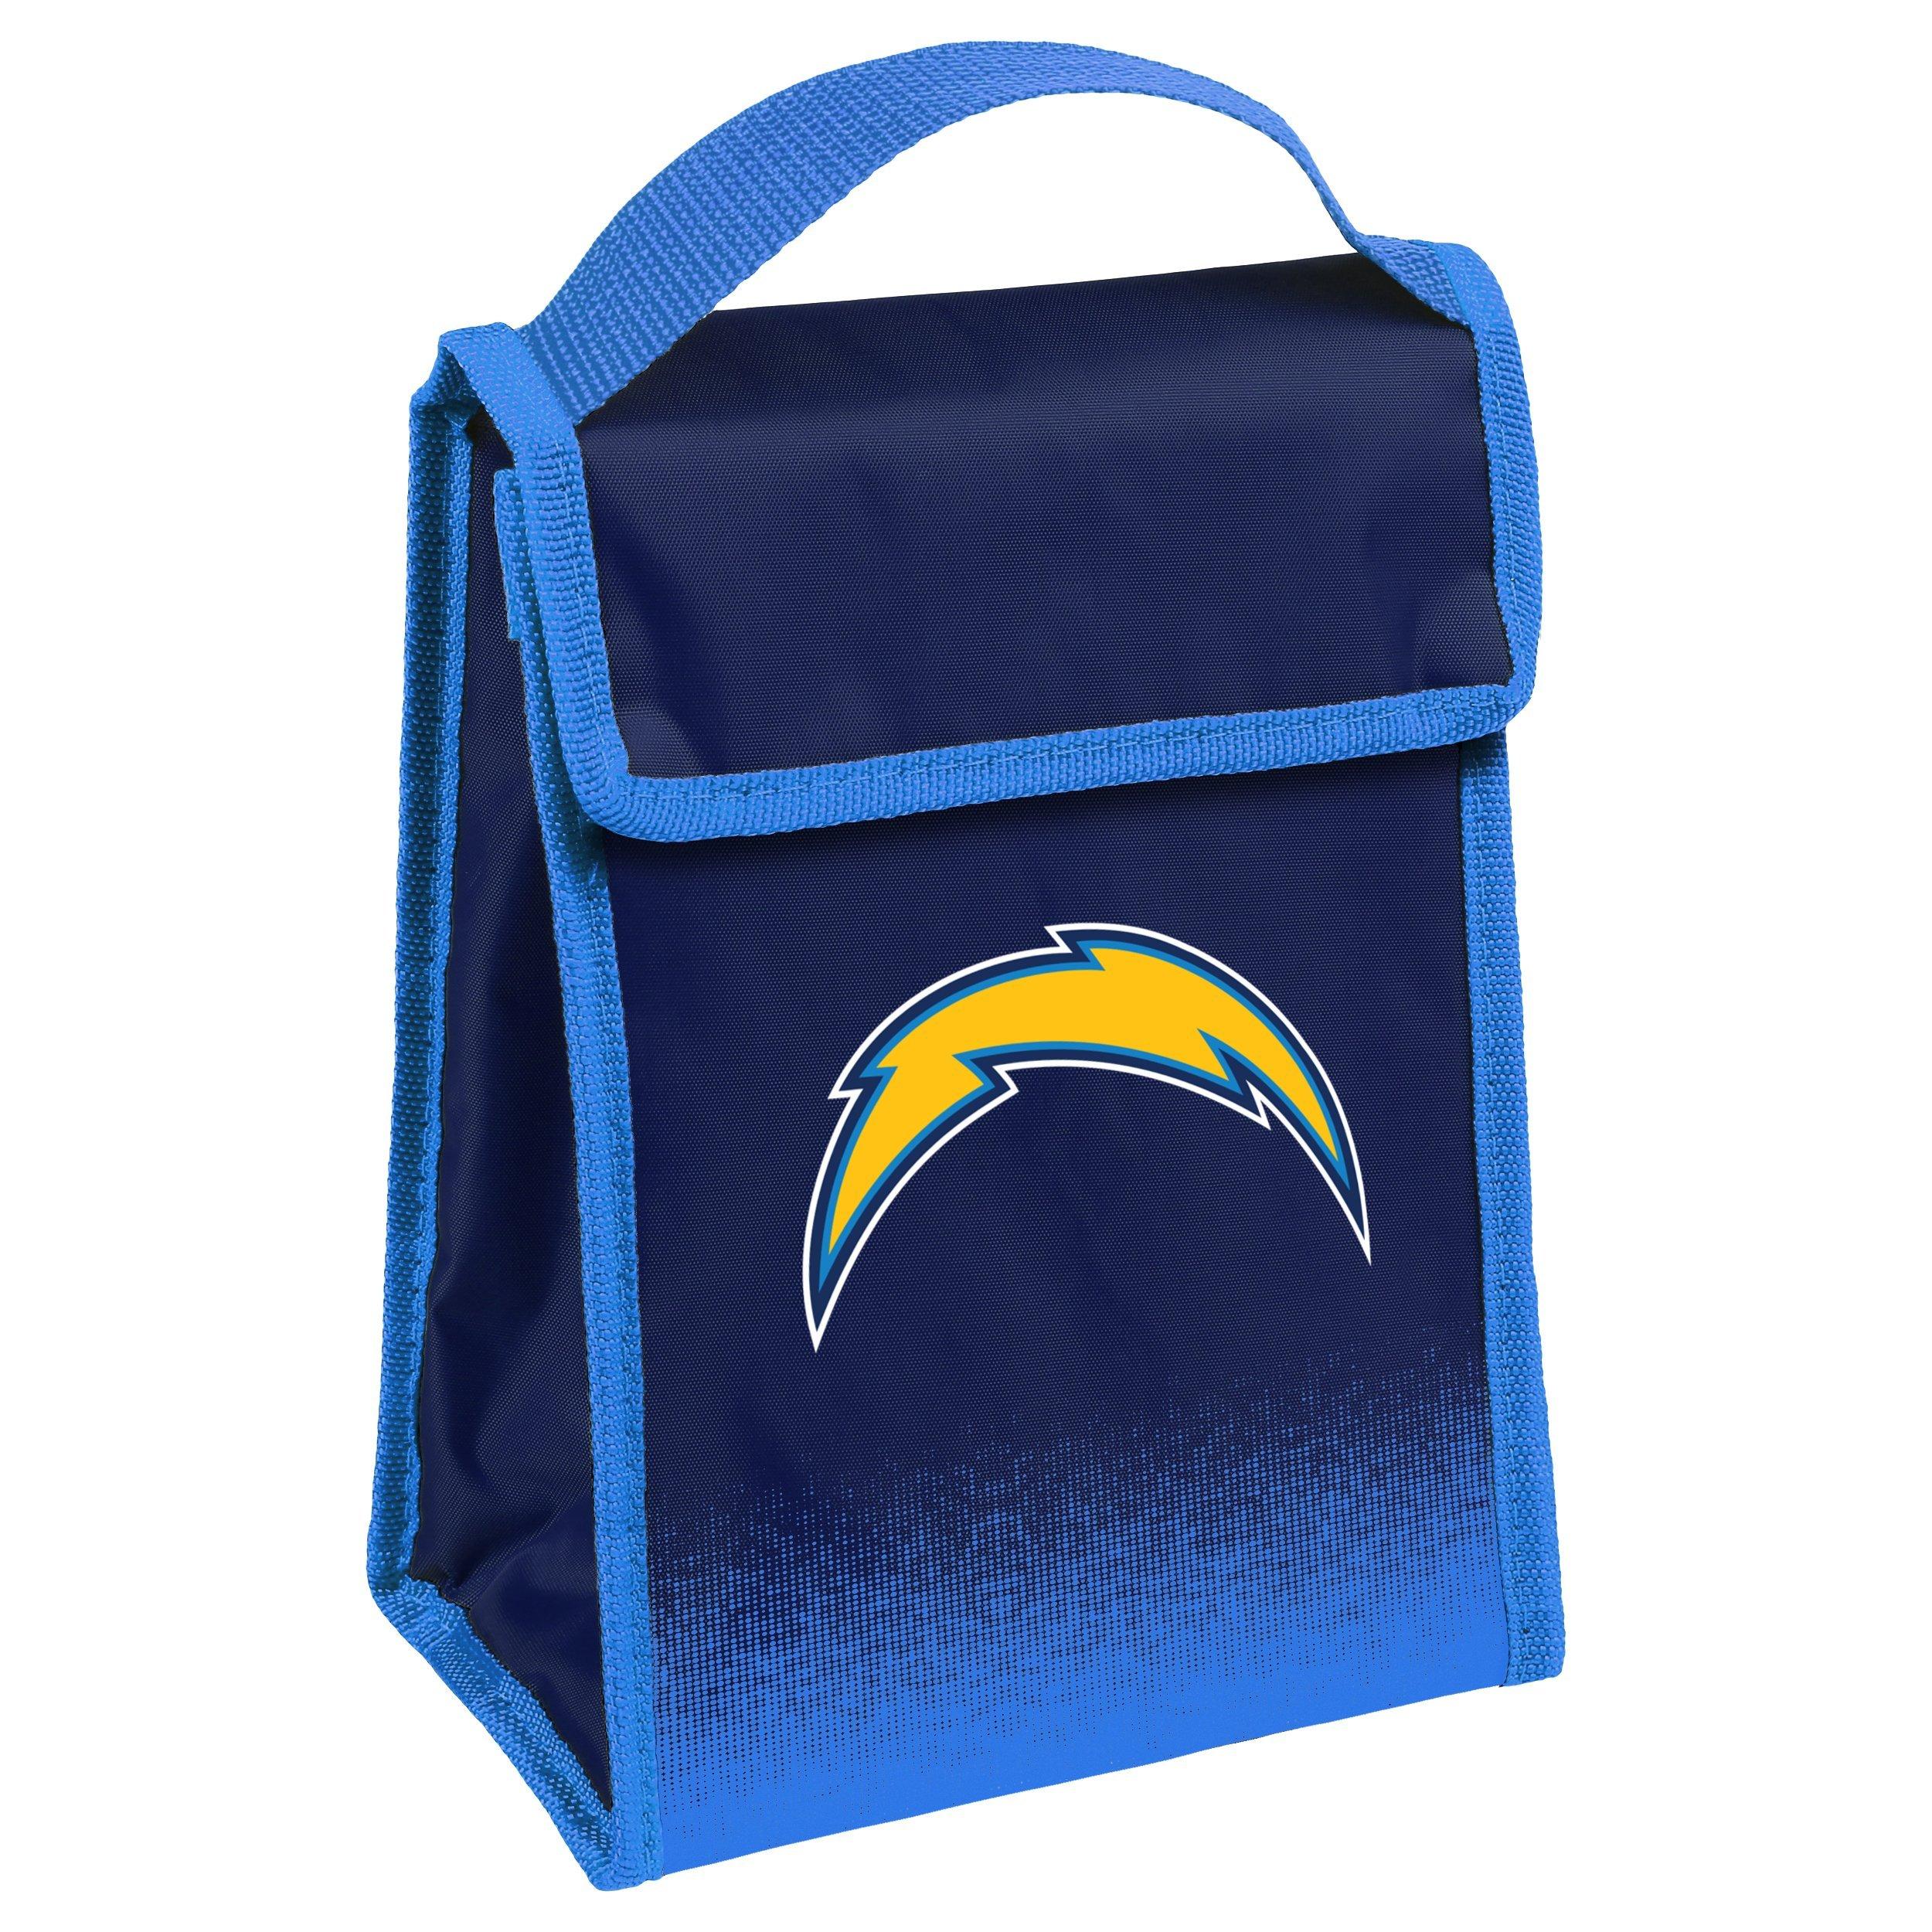 Forever Collectibles NFL Team Logo Gradient Lunch Bag Cooler